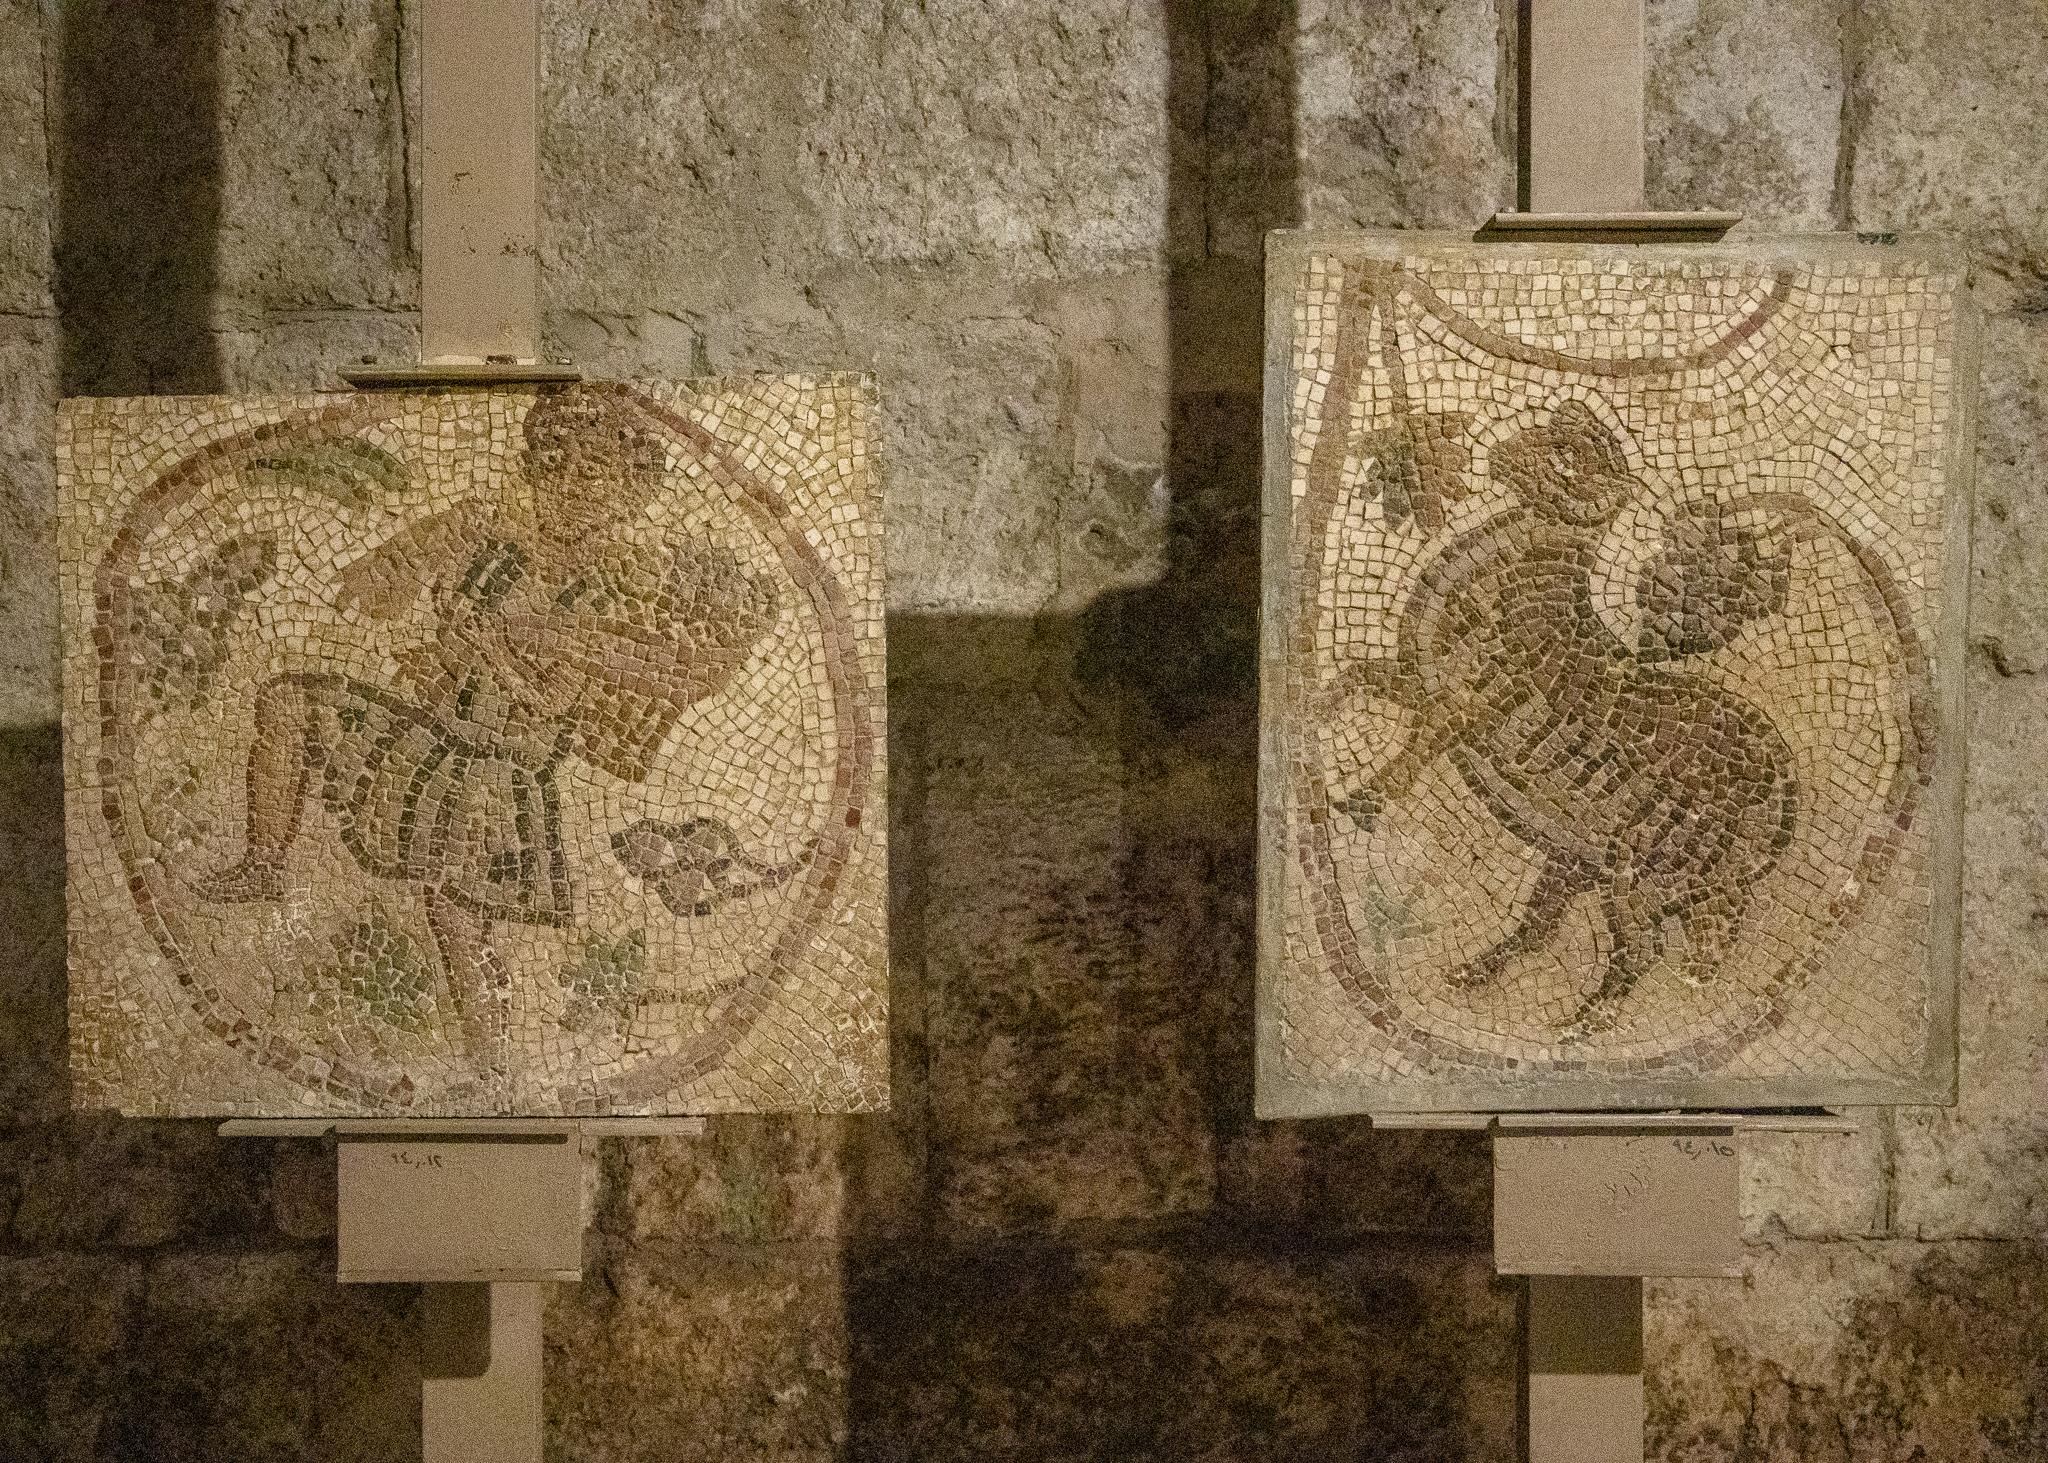 Some fine mosaics